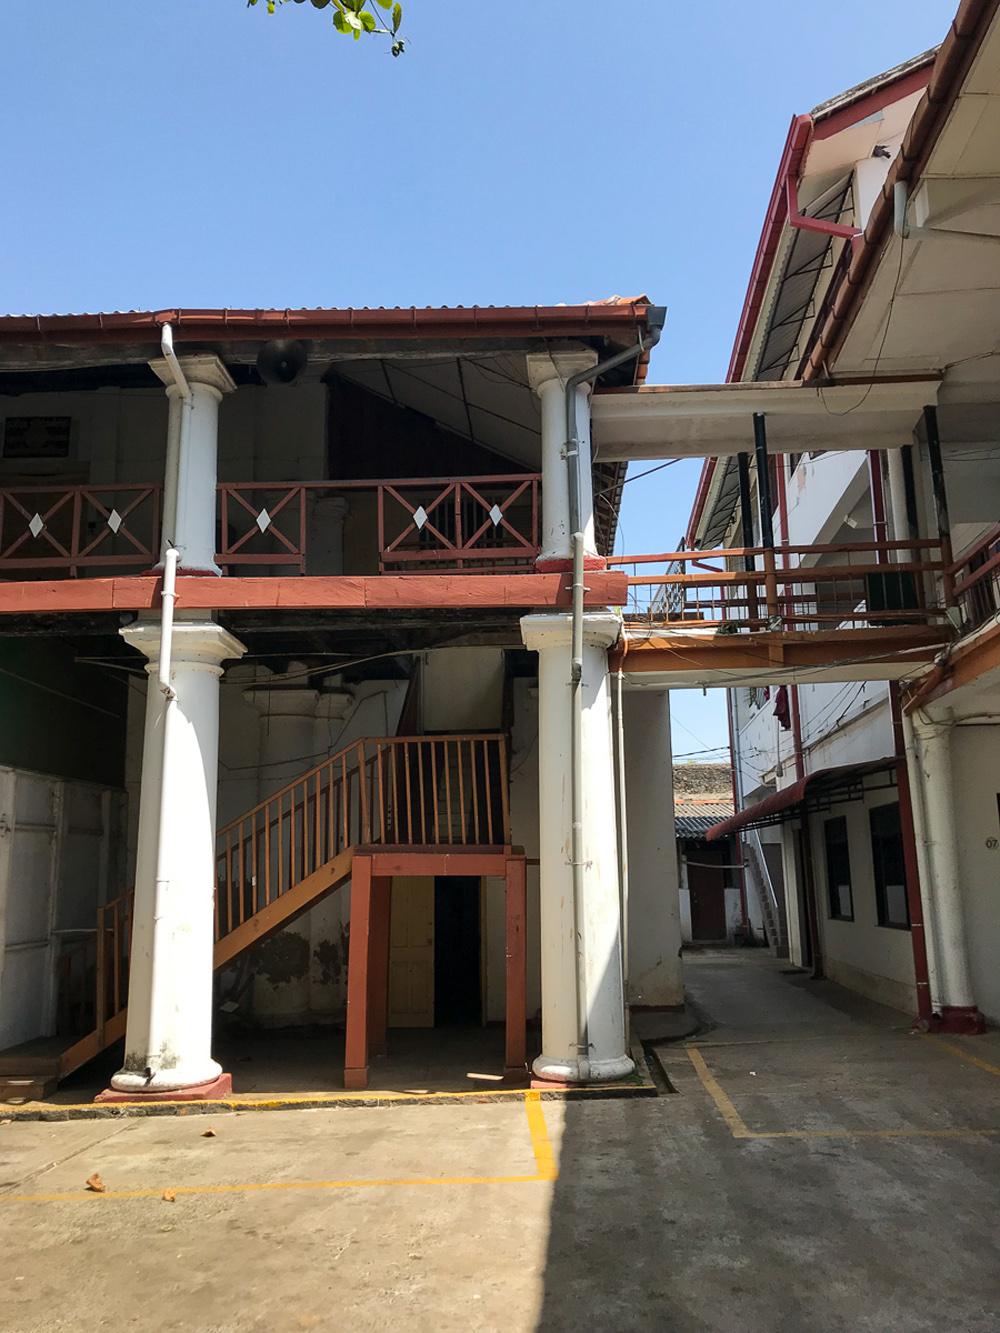 Sri Lanka Batticaloa Dutch Fort